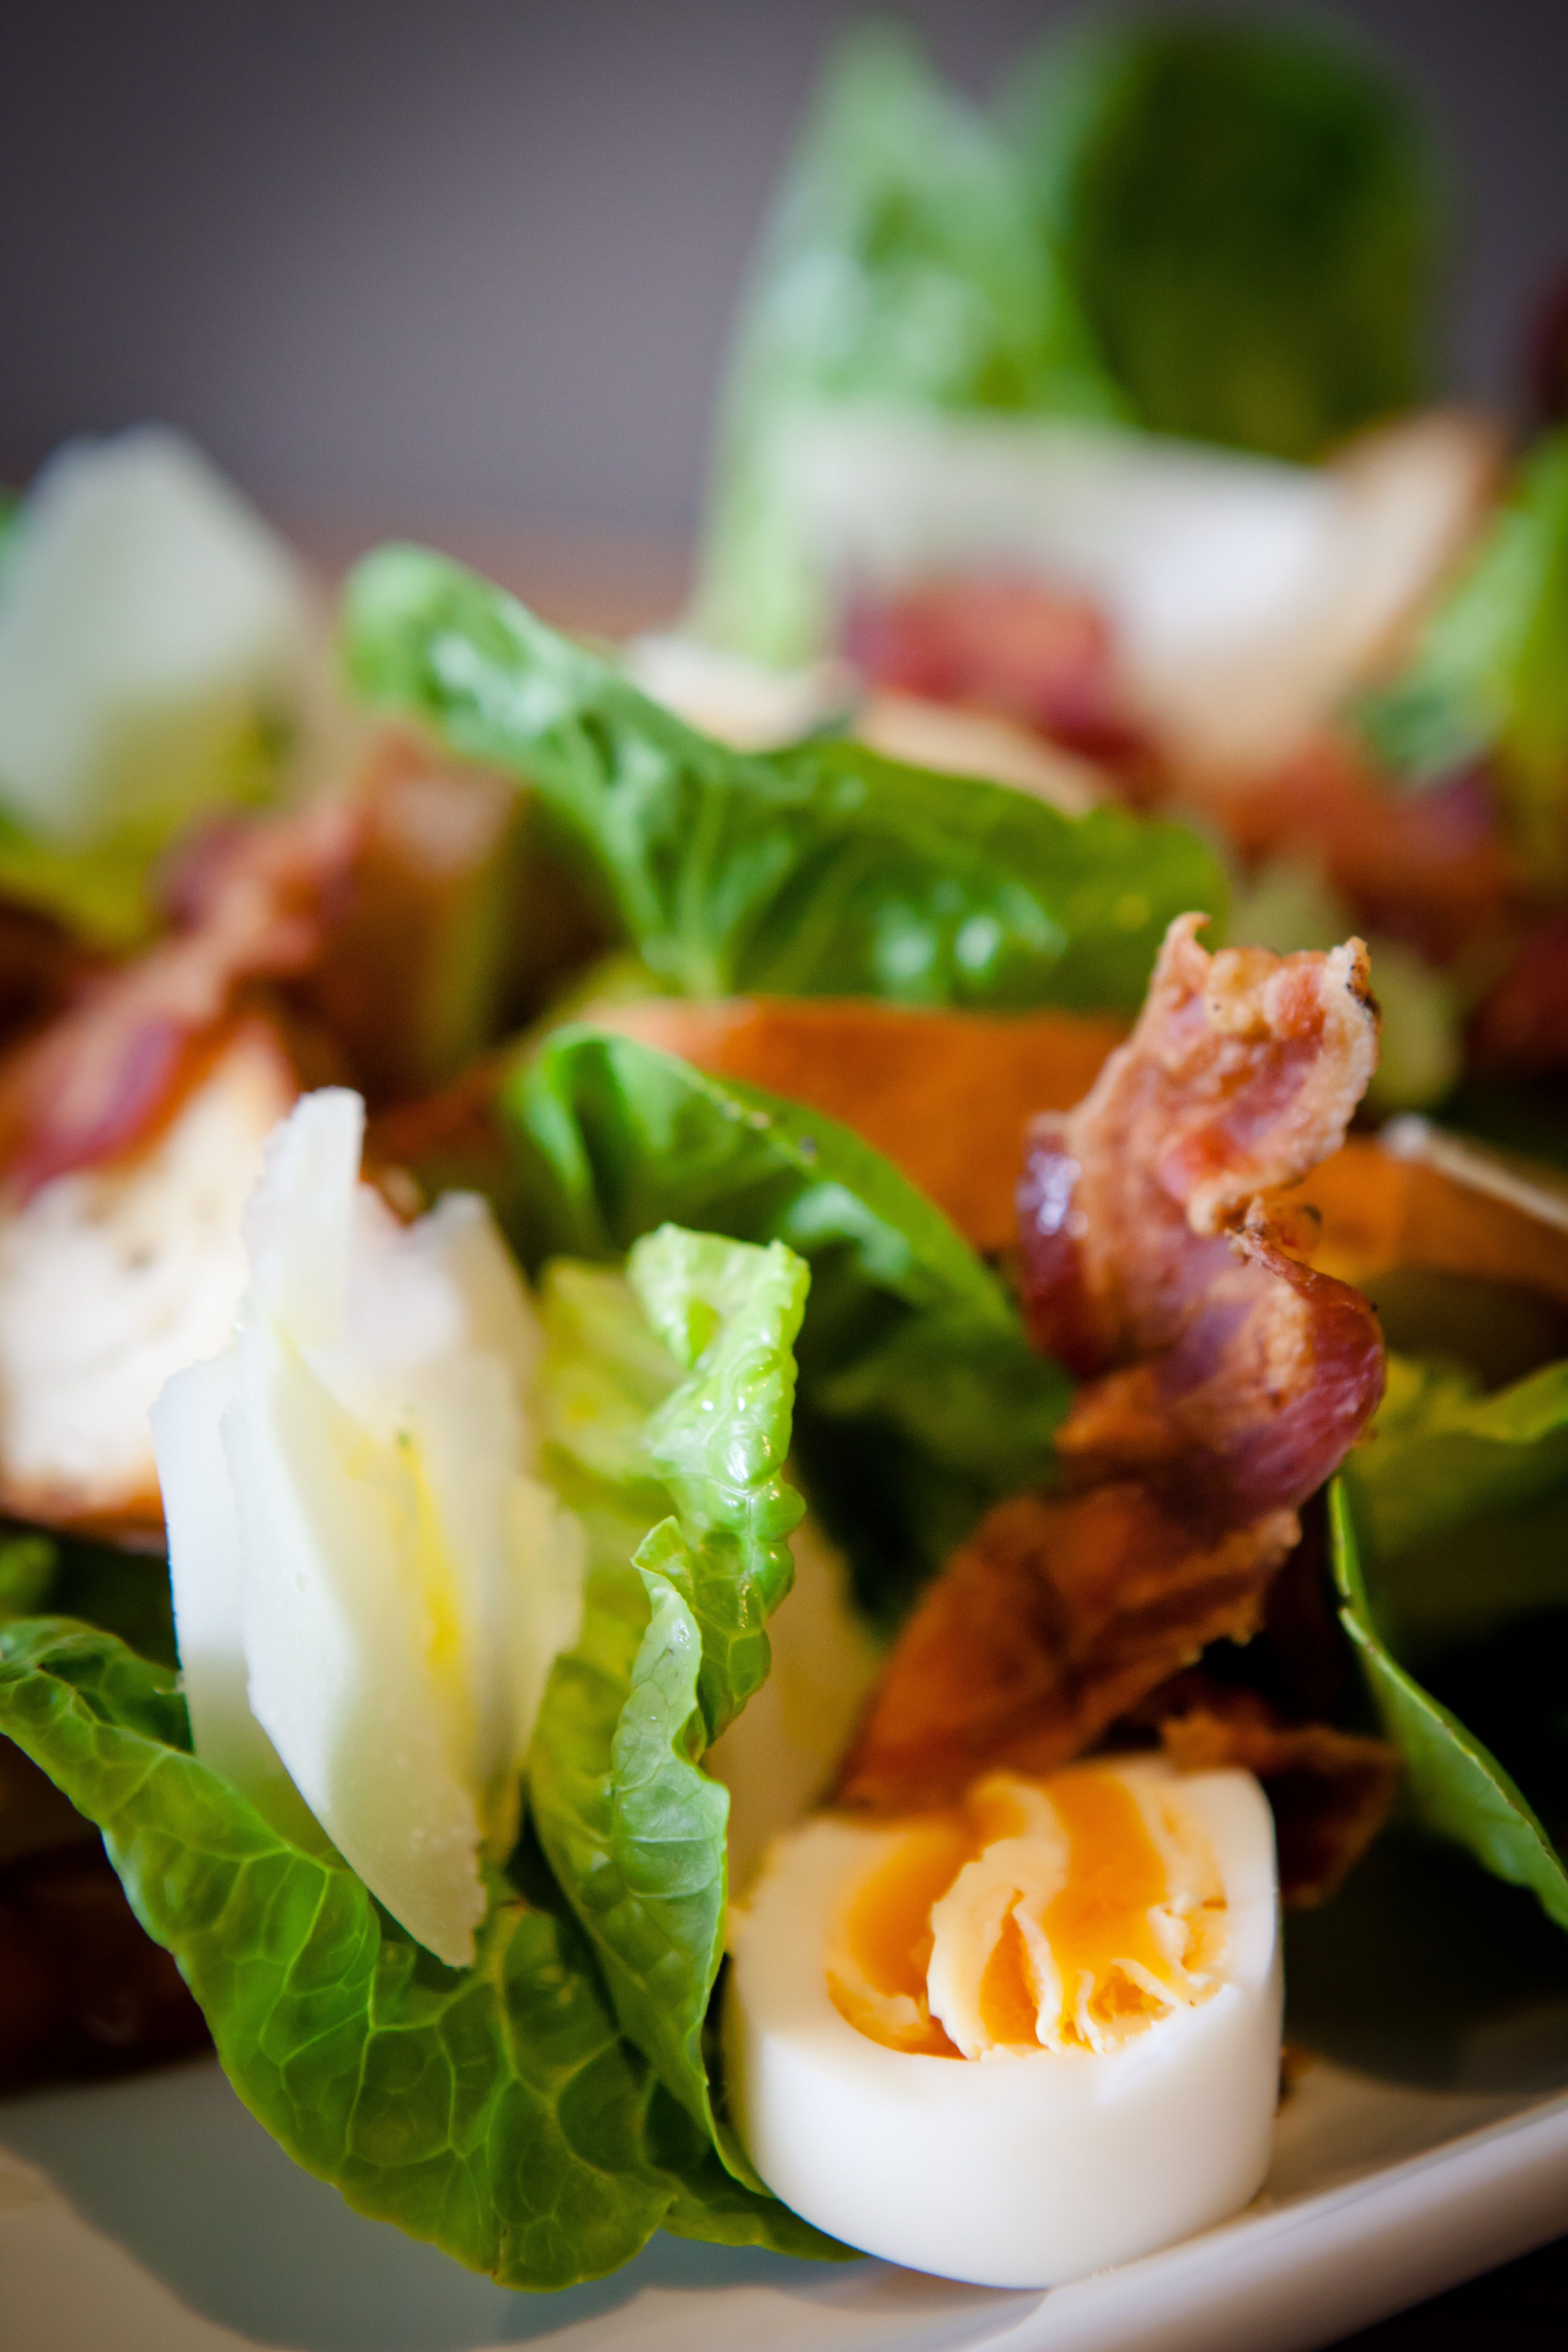 Glenby's Caesar salad